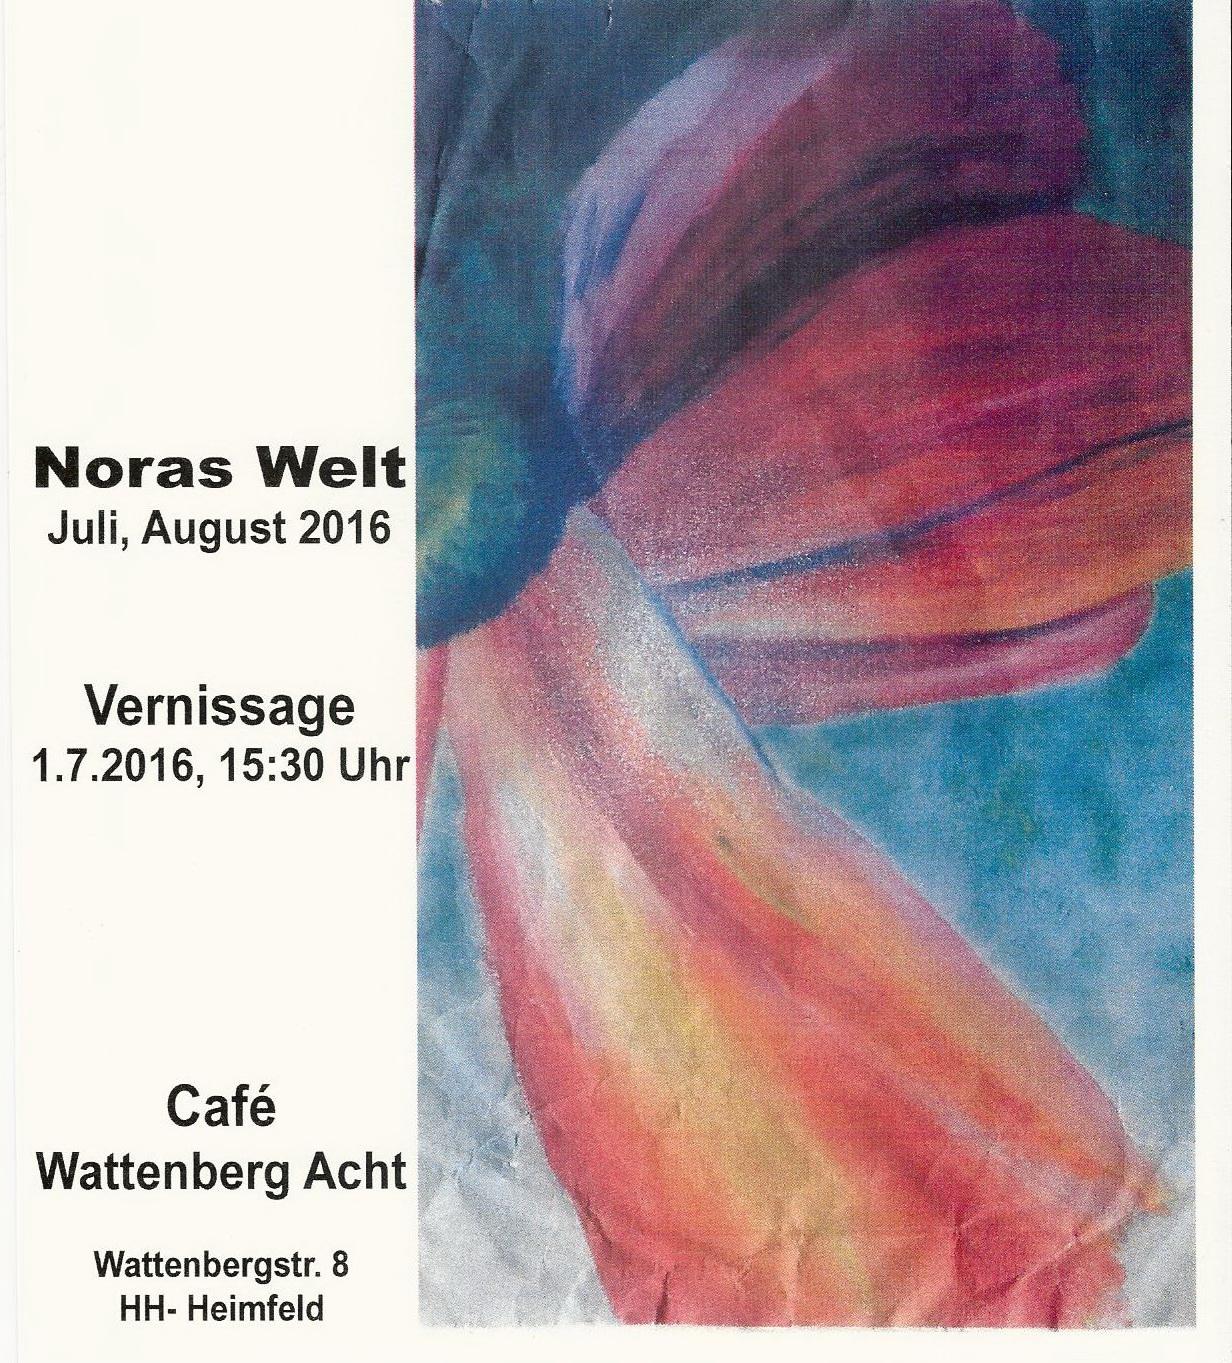 Noras Welt